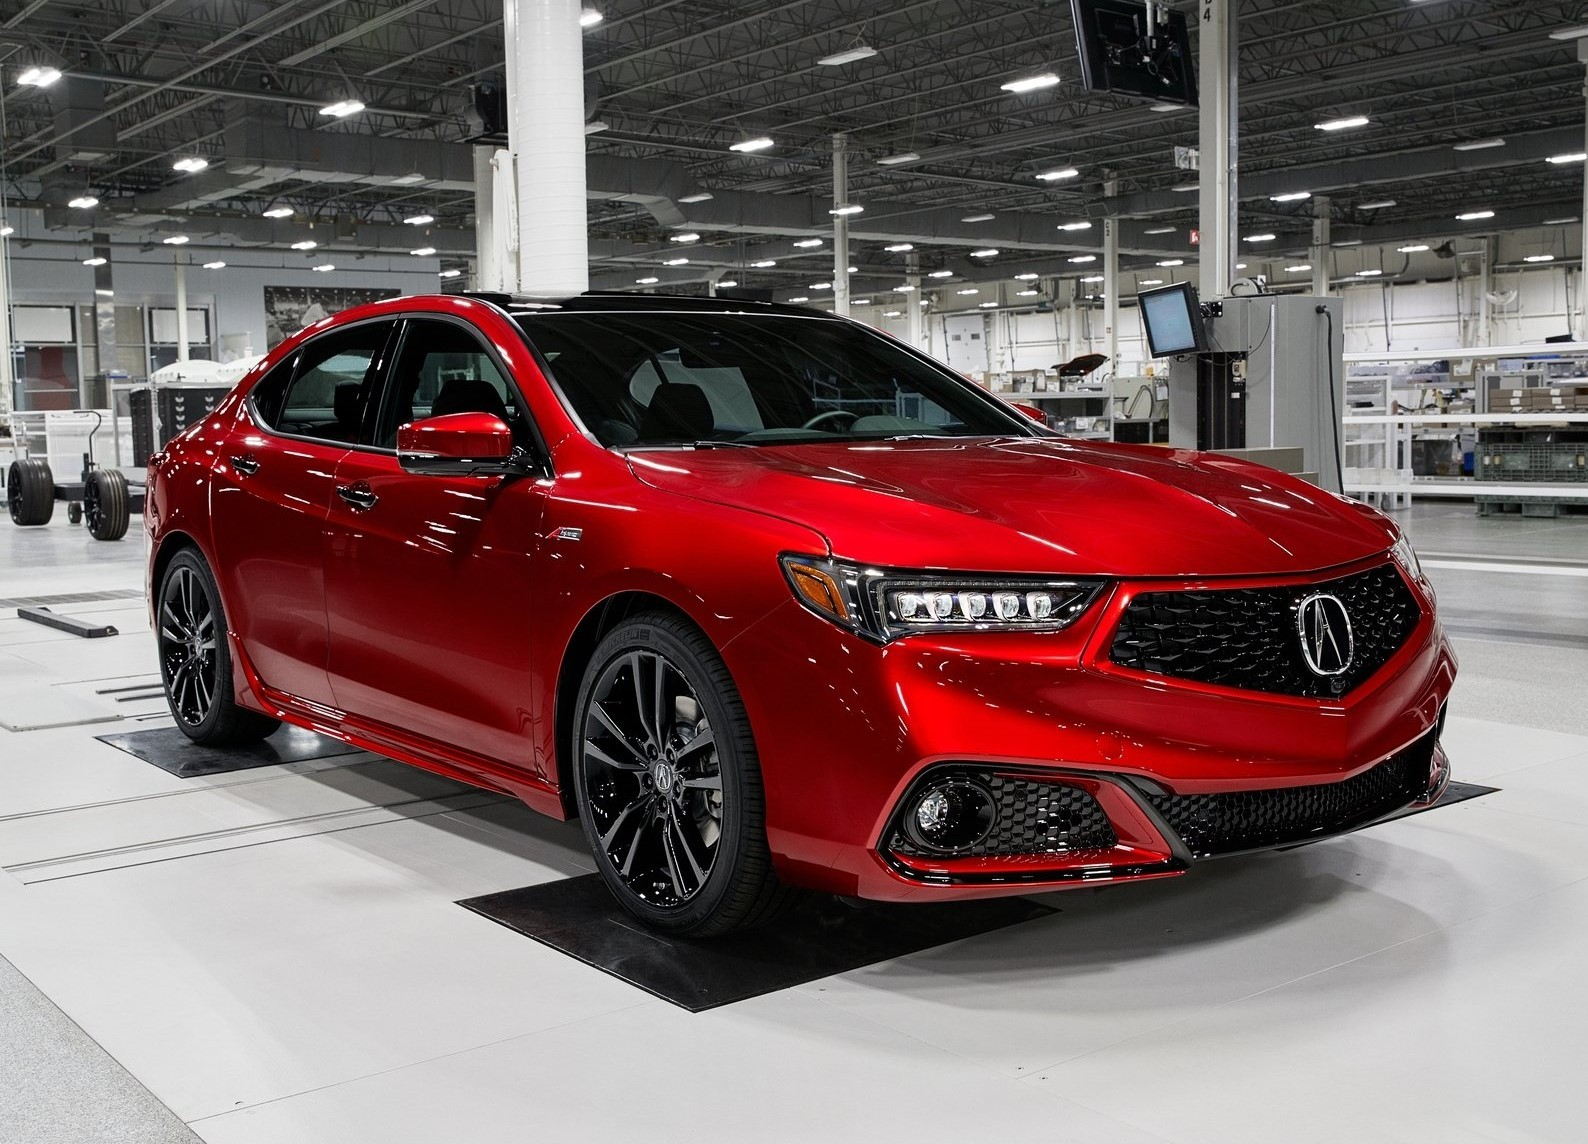 Acura TLX PMC Edition 2020 – Seules 360 voitures seront produites.